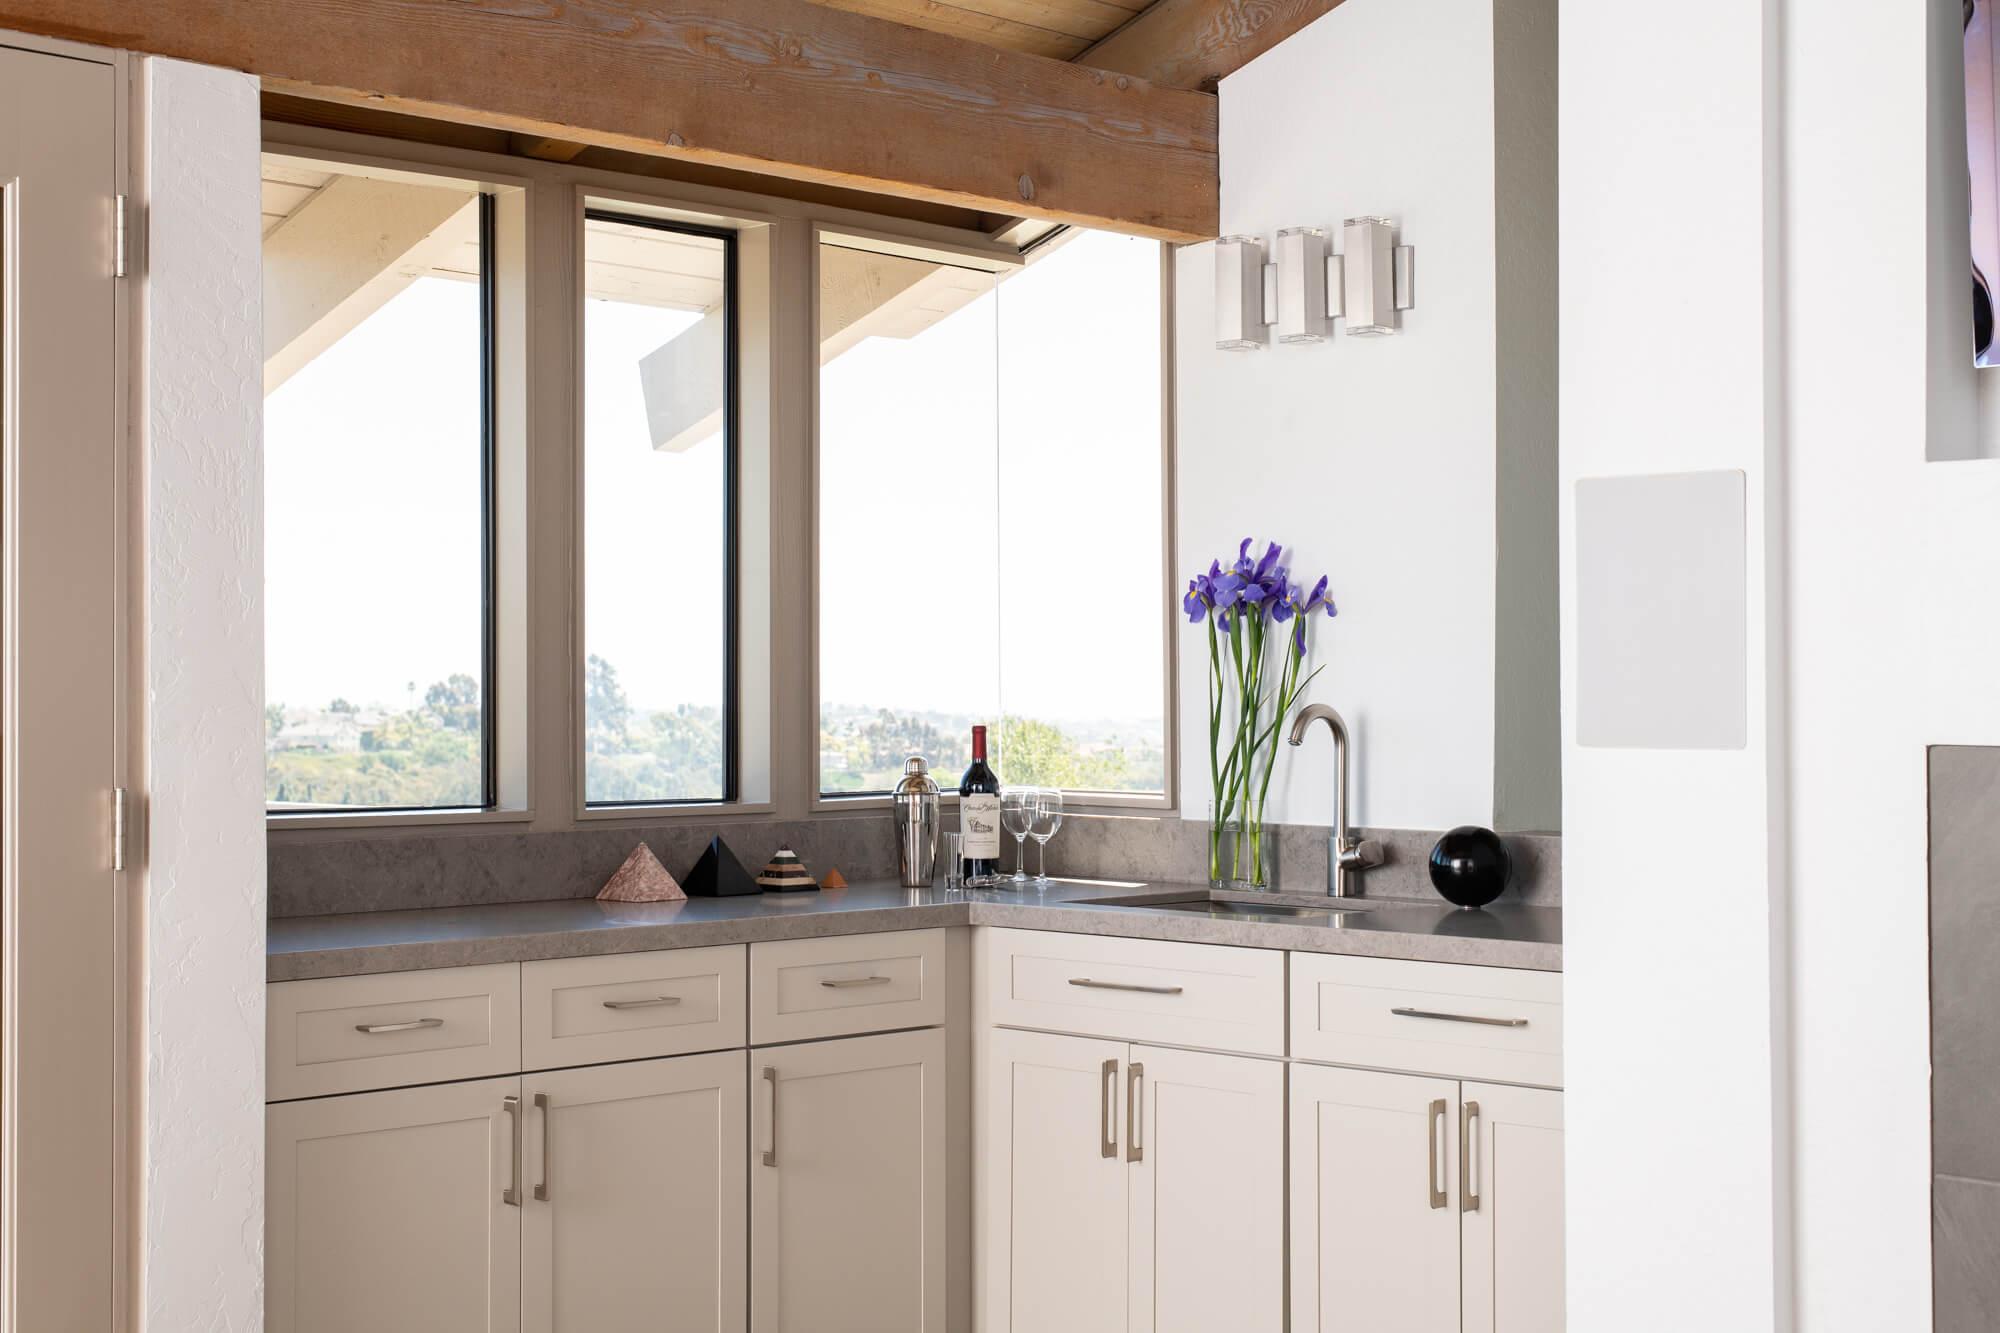 Home bar design for a nook